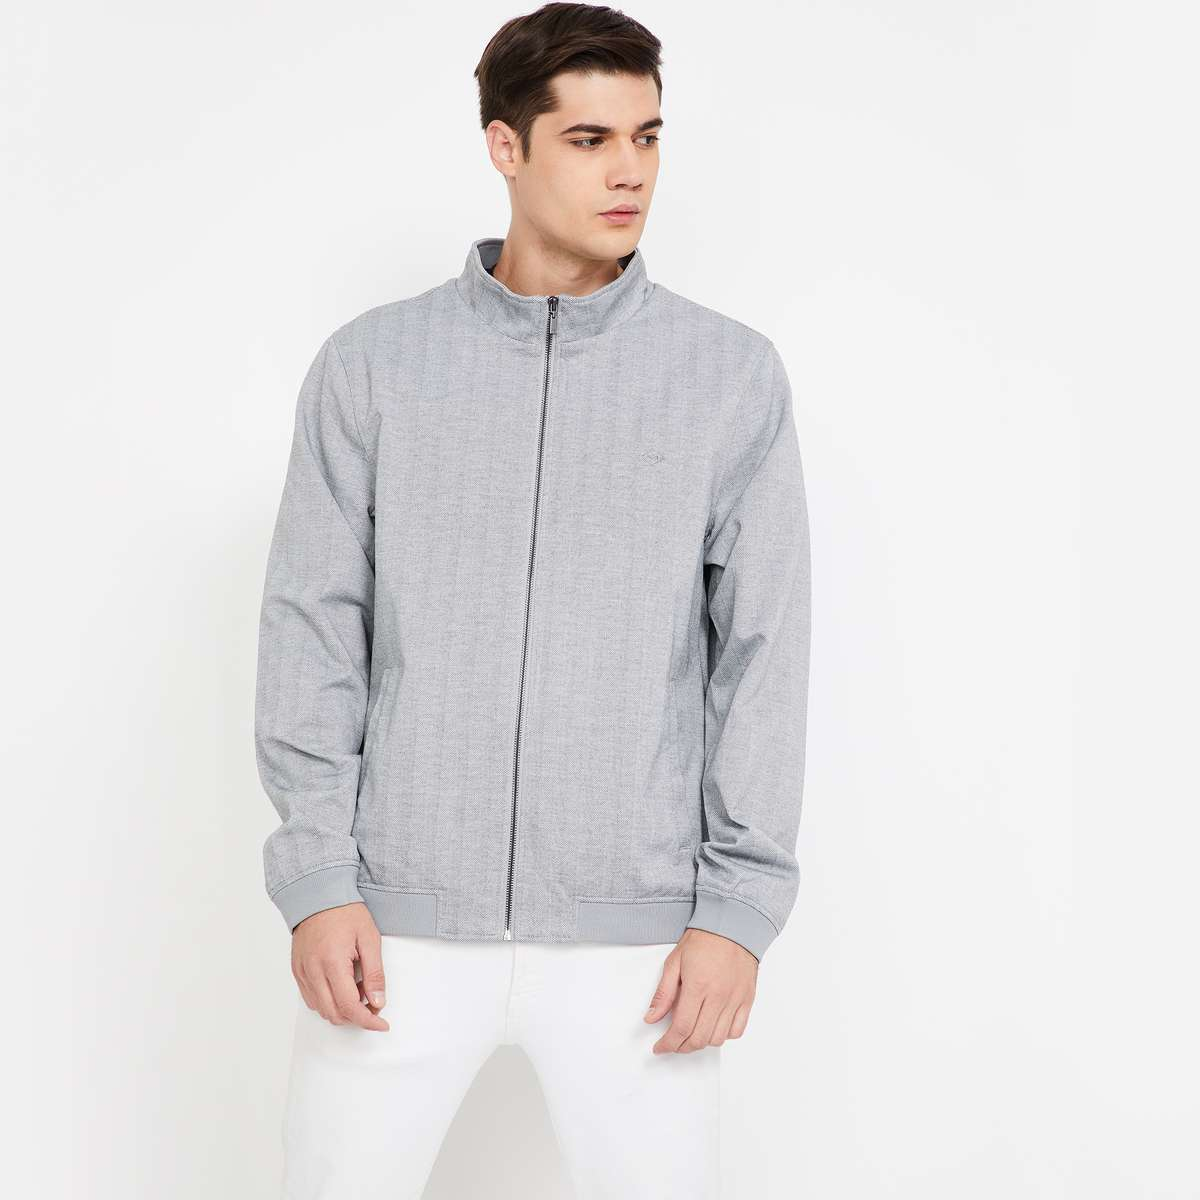 ARROW SPORT Striped Zip-Up Jacket